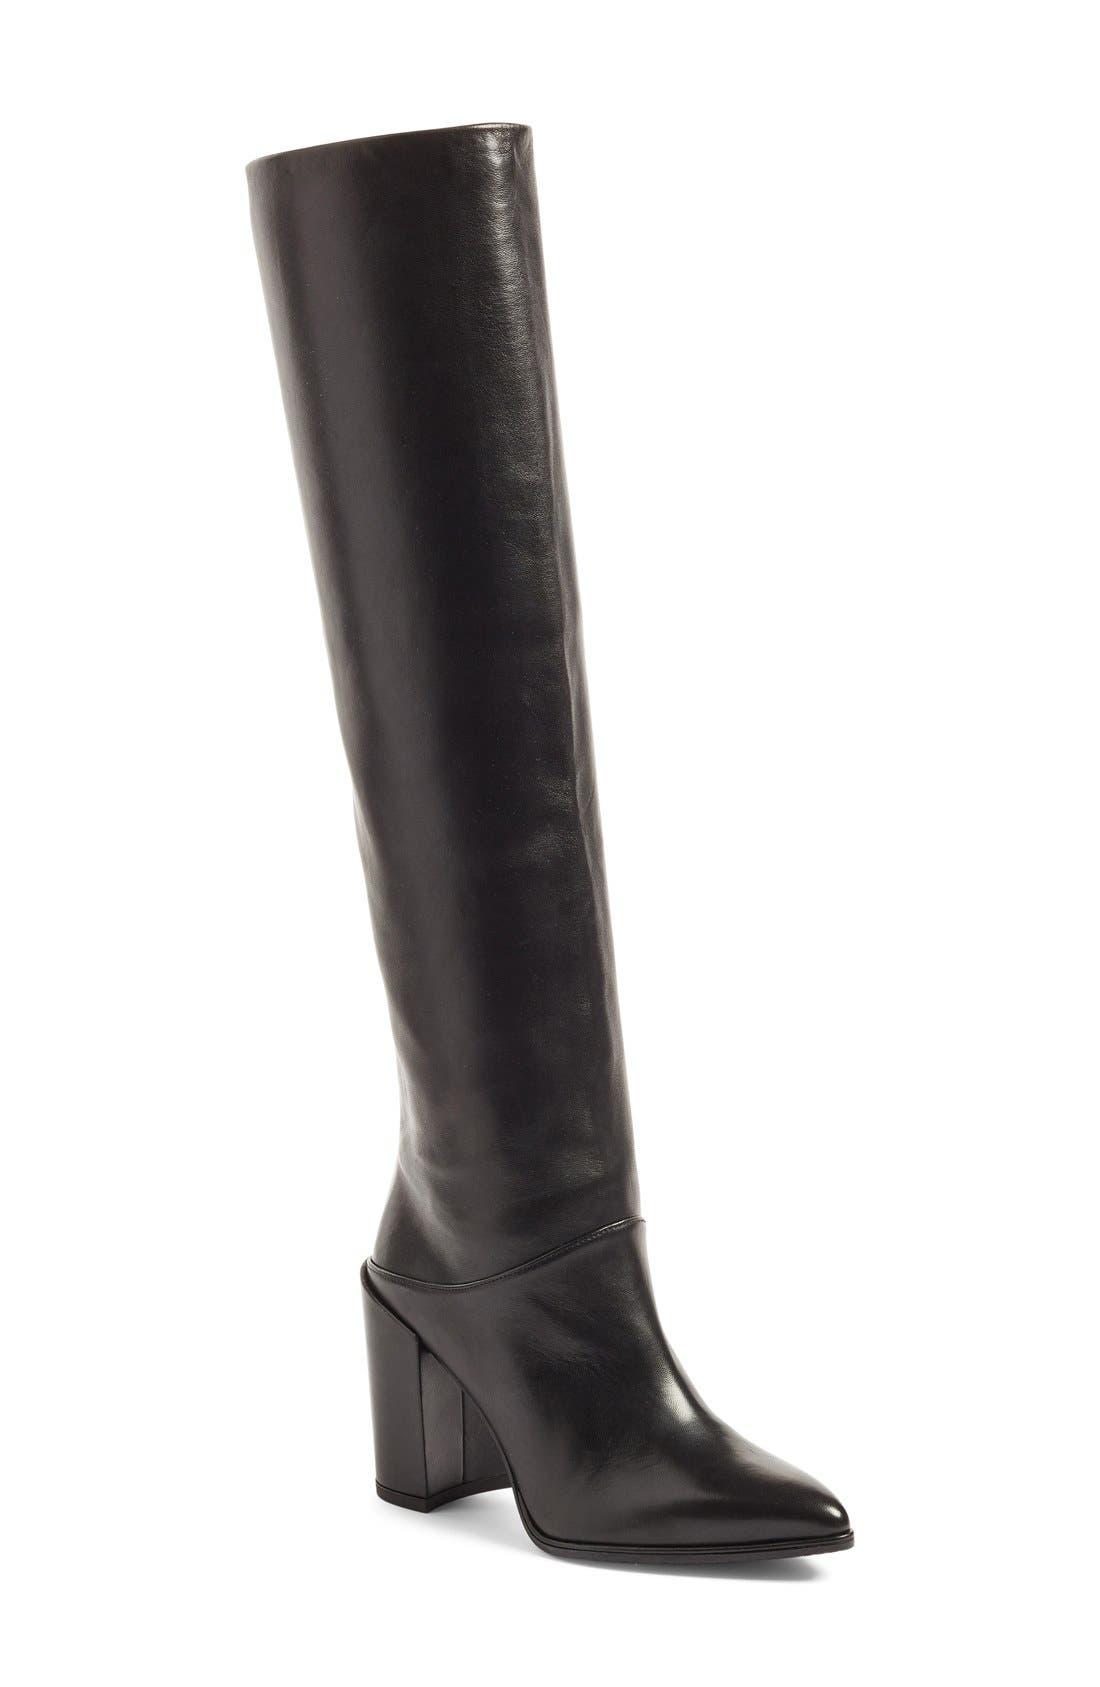 Alternate Image 1 Selected - Stuart Weitzman Scrunchy Leather Knee High Boot (Women)